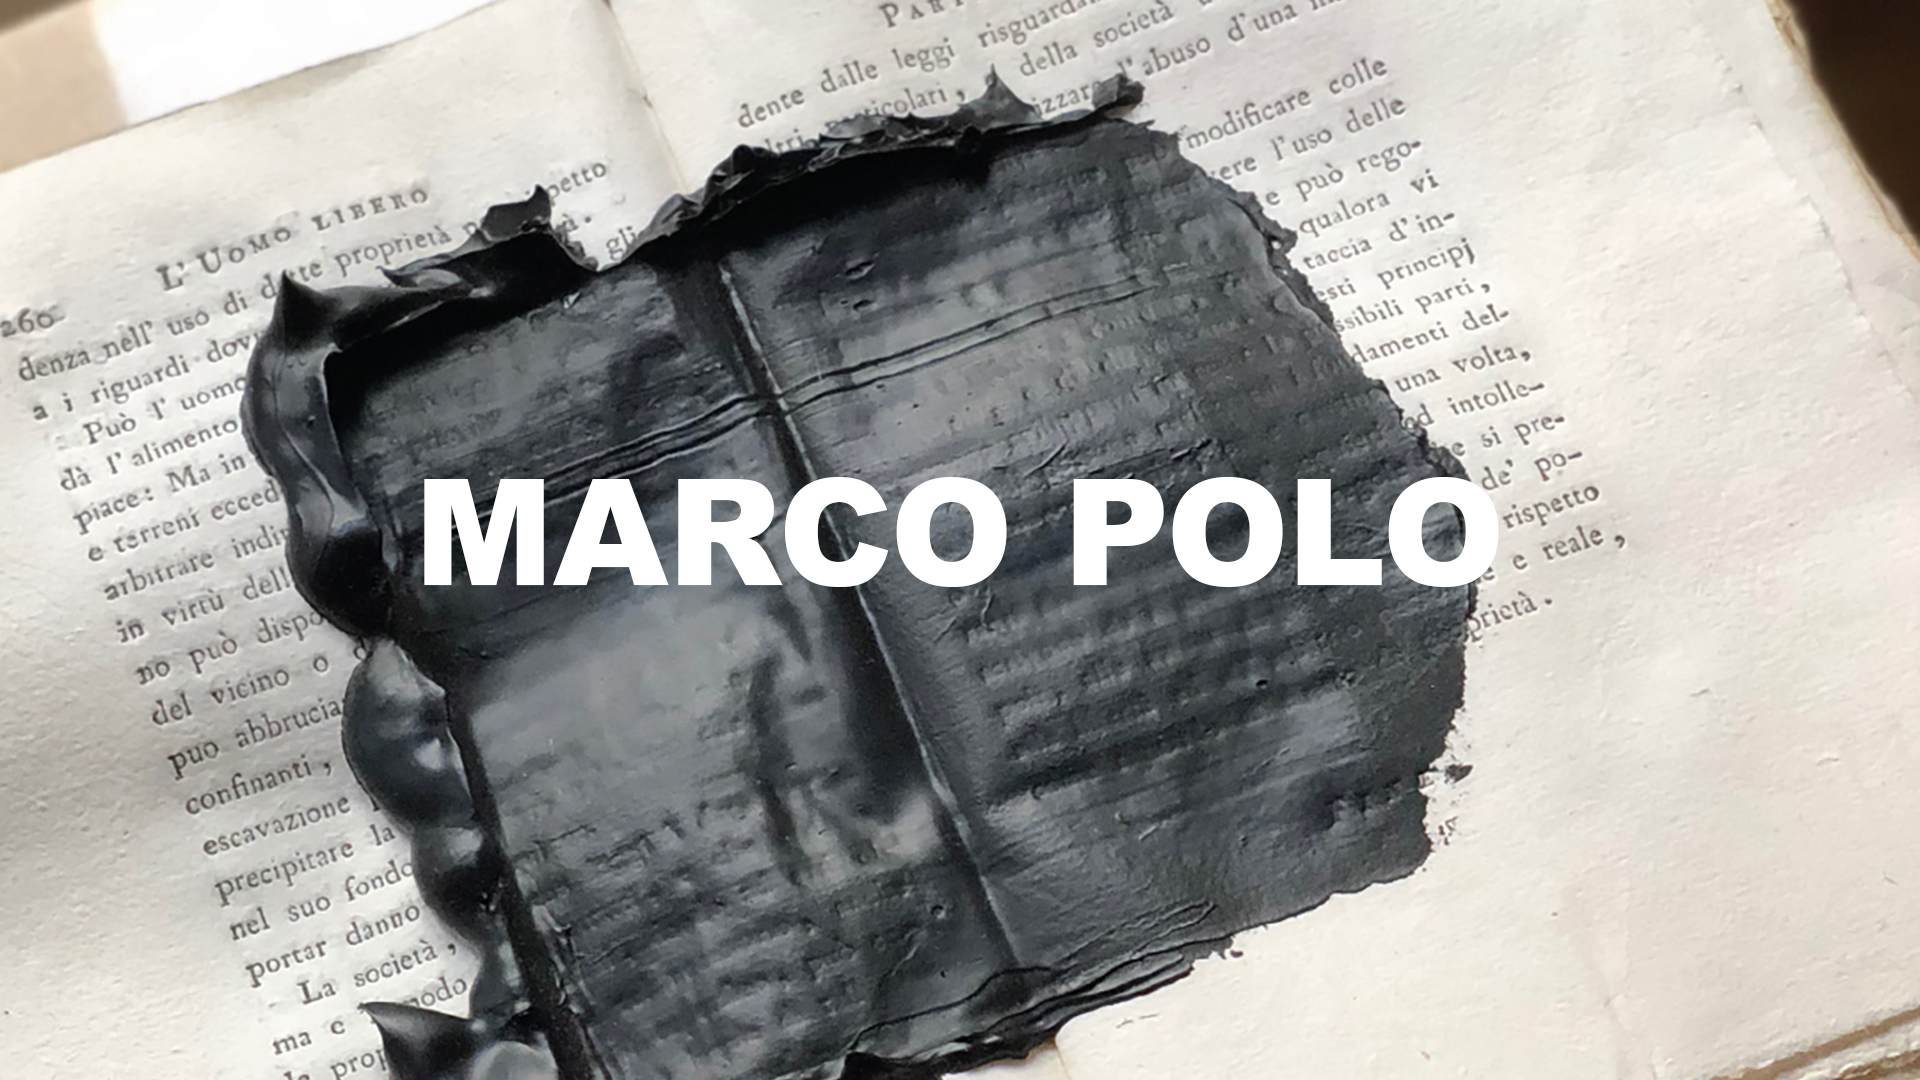 MARCOPOLO-AARON-NACHTAILER-ART-ARTIST-SCULPTURES-COVER